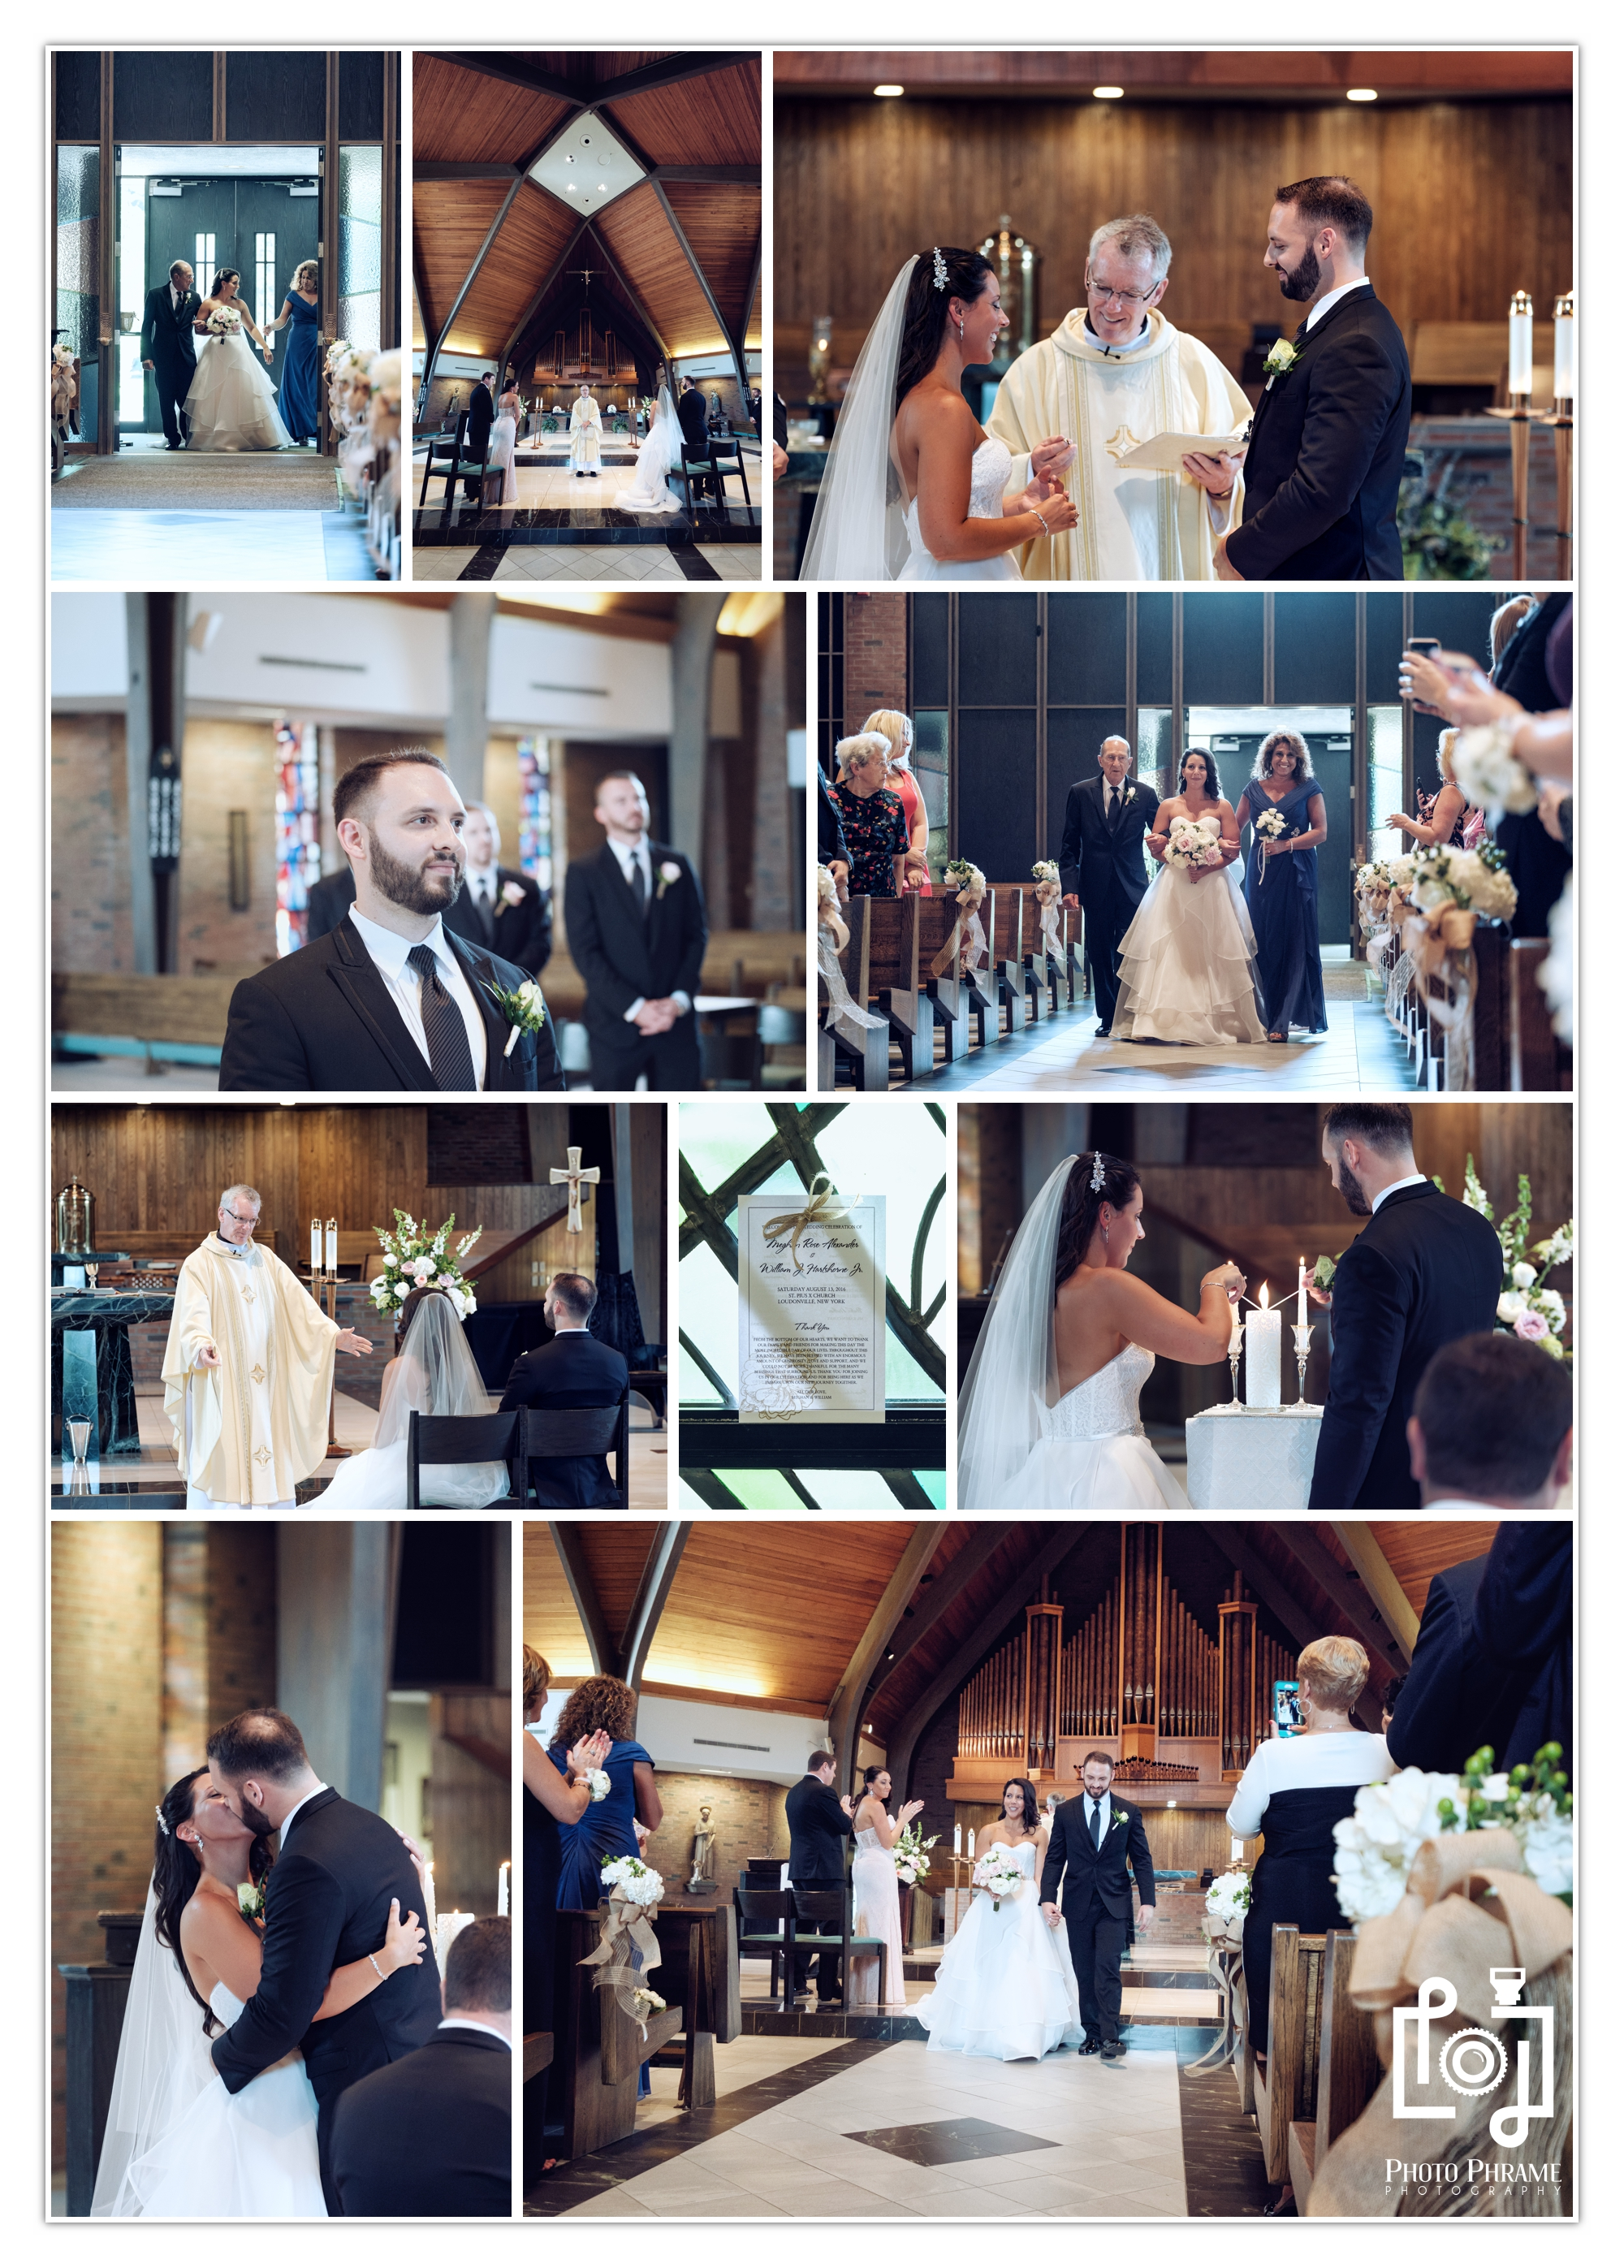 St. Pius X Church Wedding